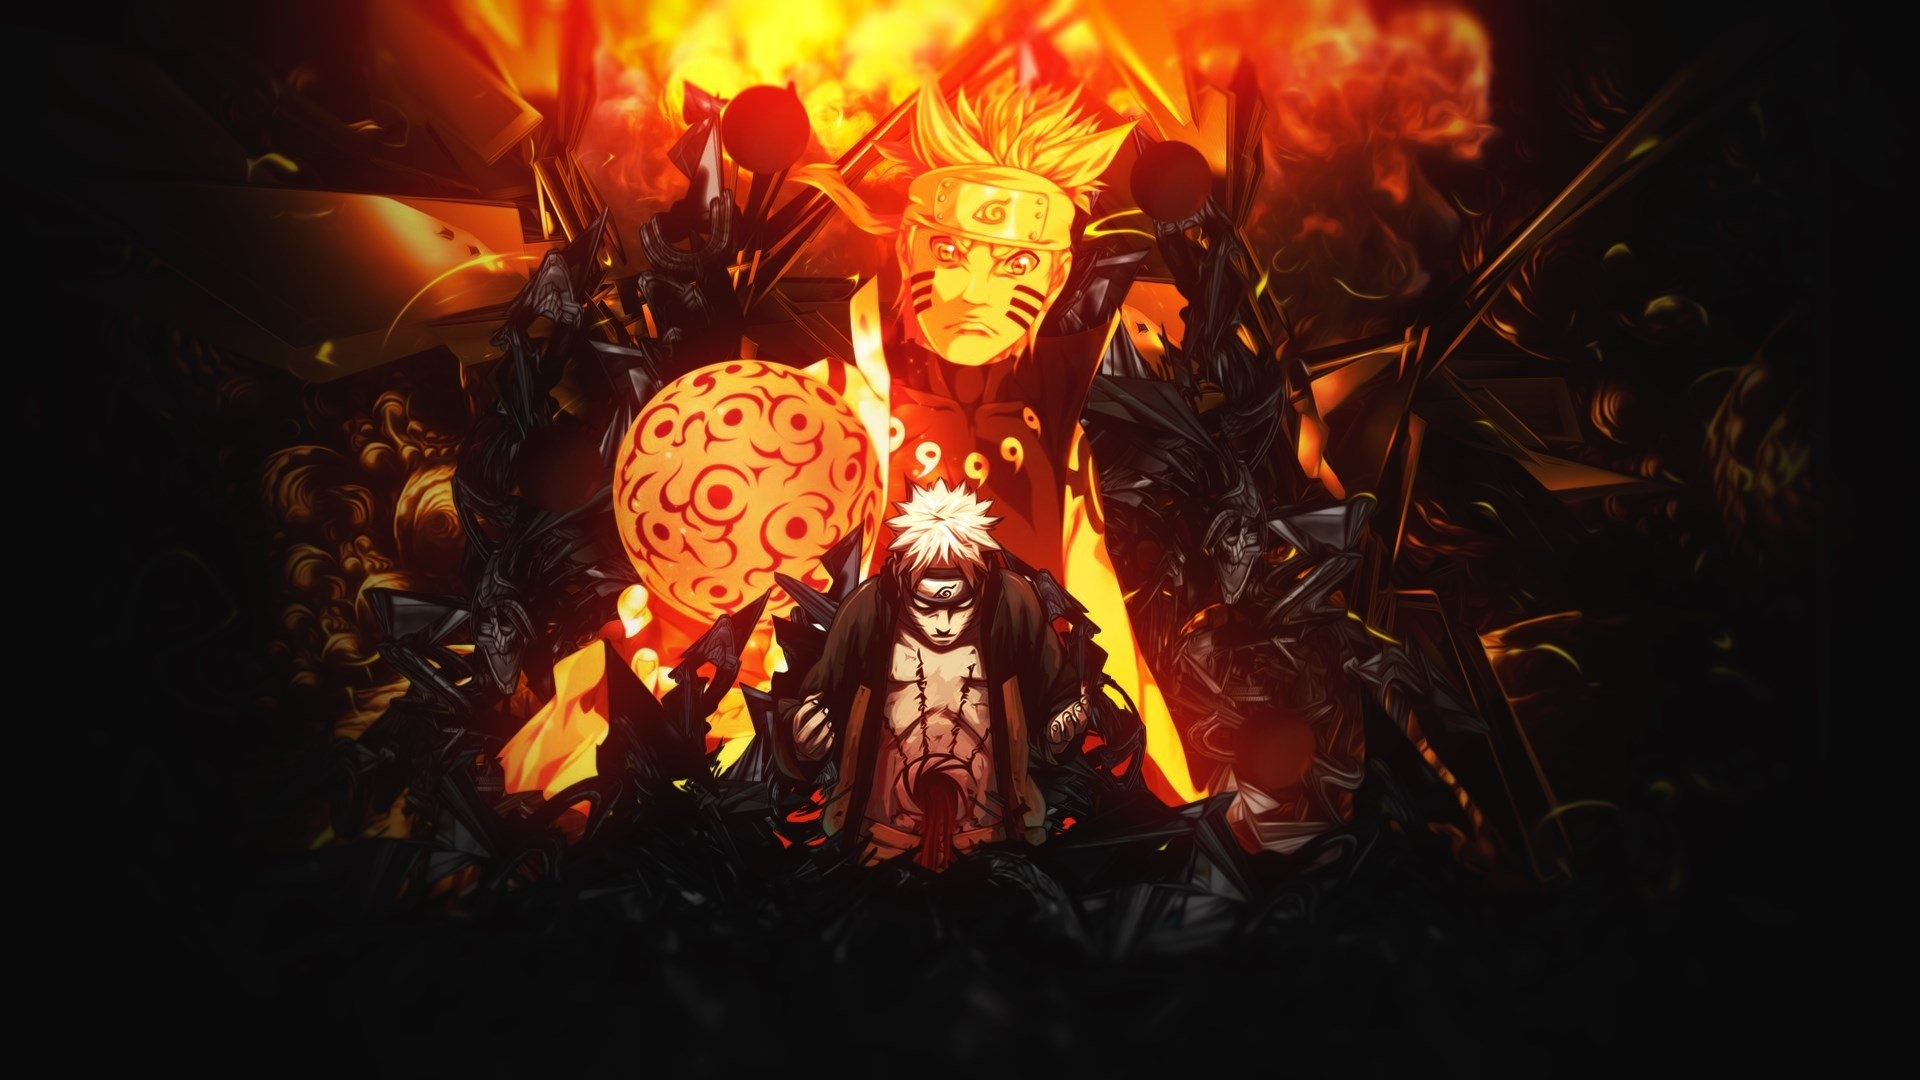 Naruto desktop background